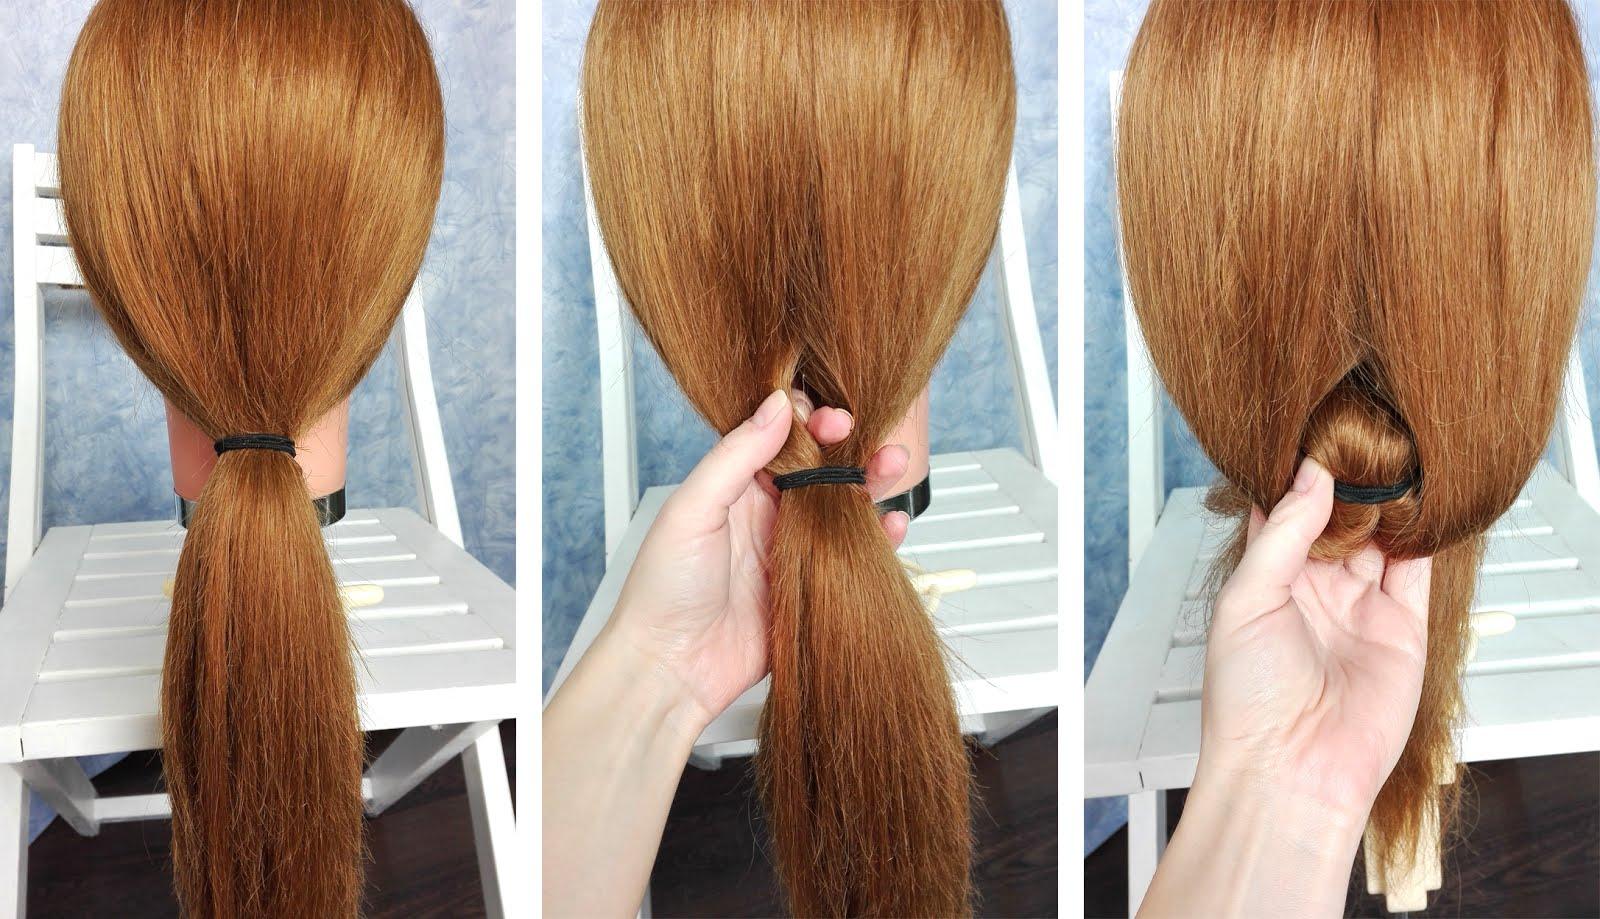 Szybki Koczek Na Co Dzień Krok Po Kroku Hair By Jul Fryzury Krok